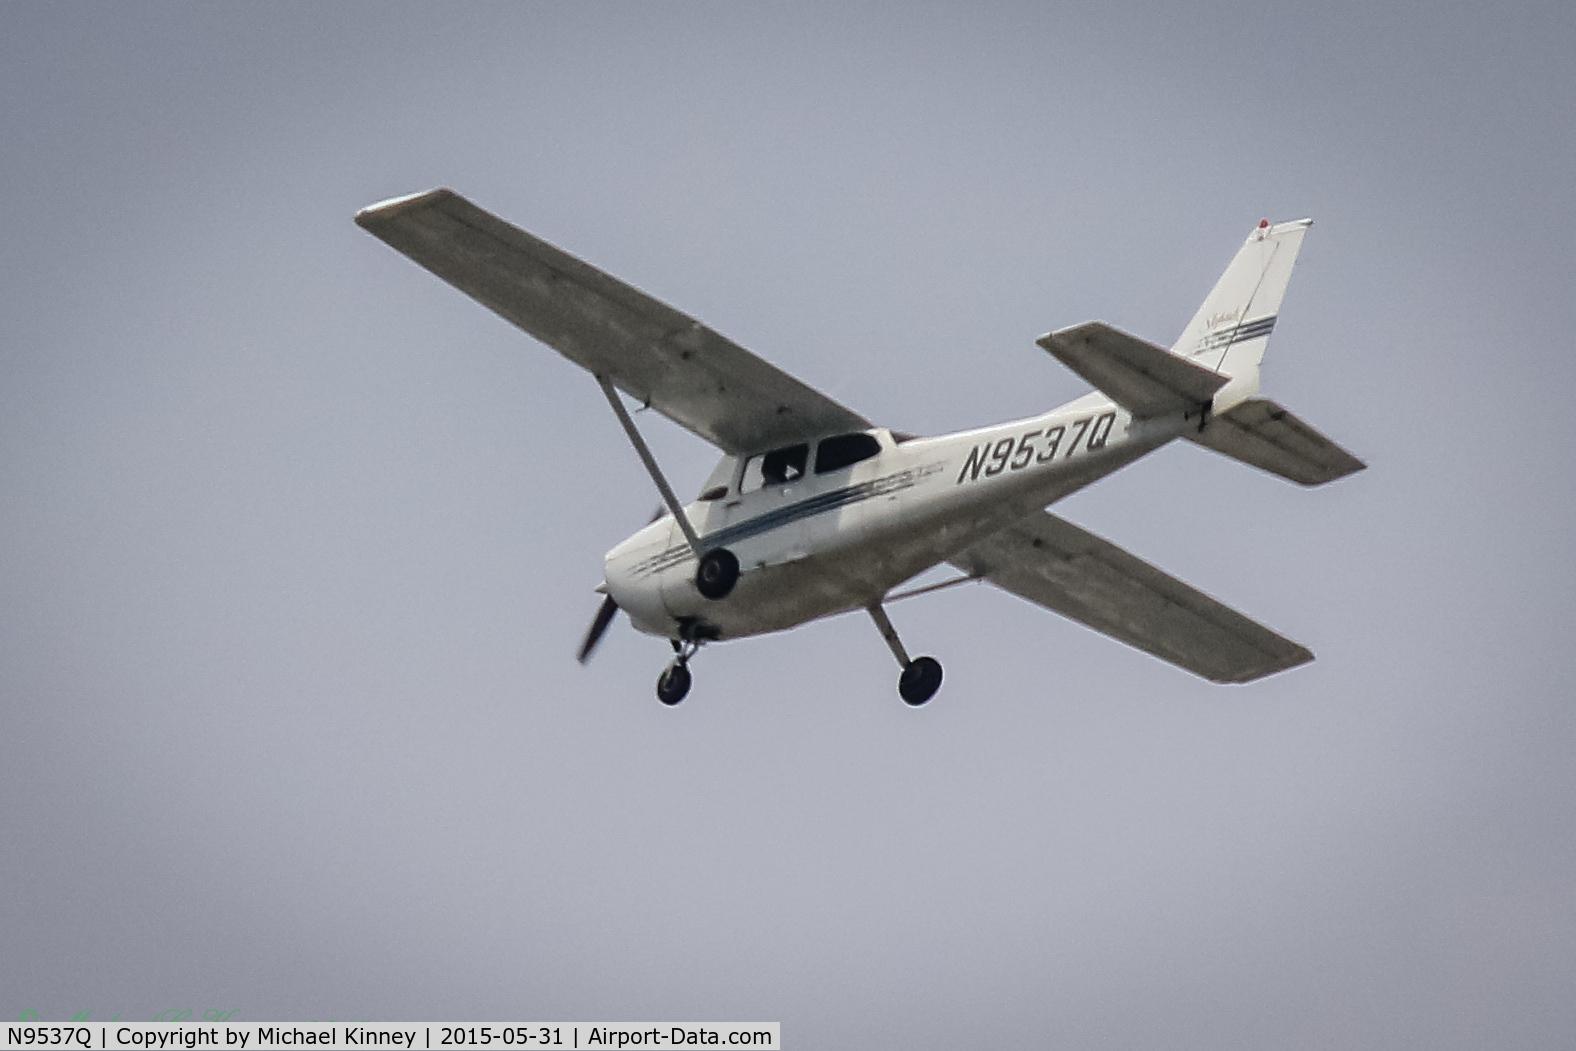 N9537Q, 1998 Cessna 172R Skyhawk C/N 17280483, Near Kent Washington